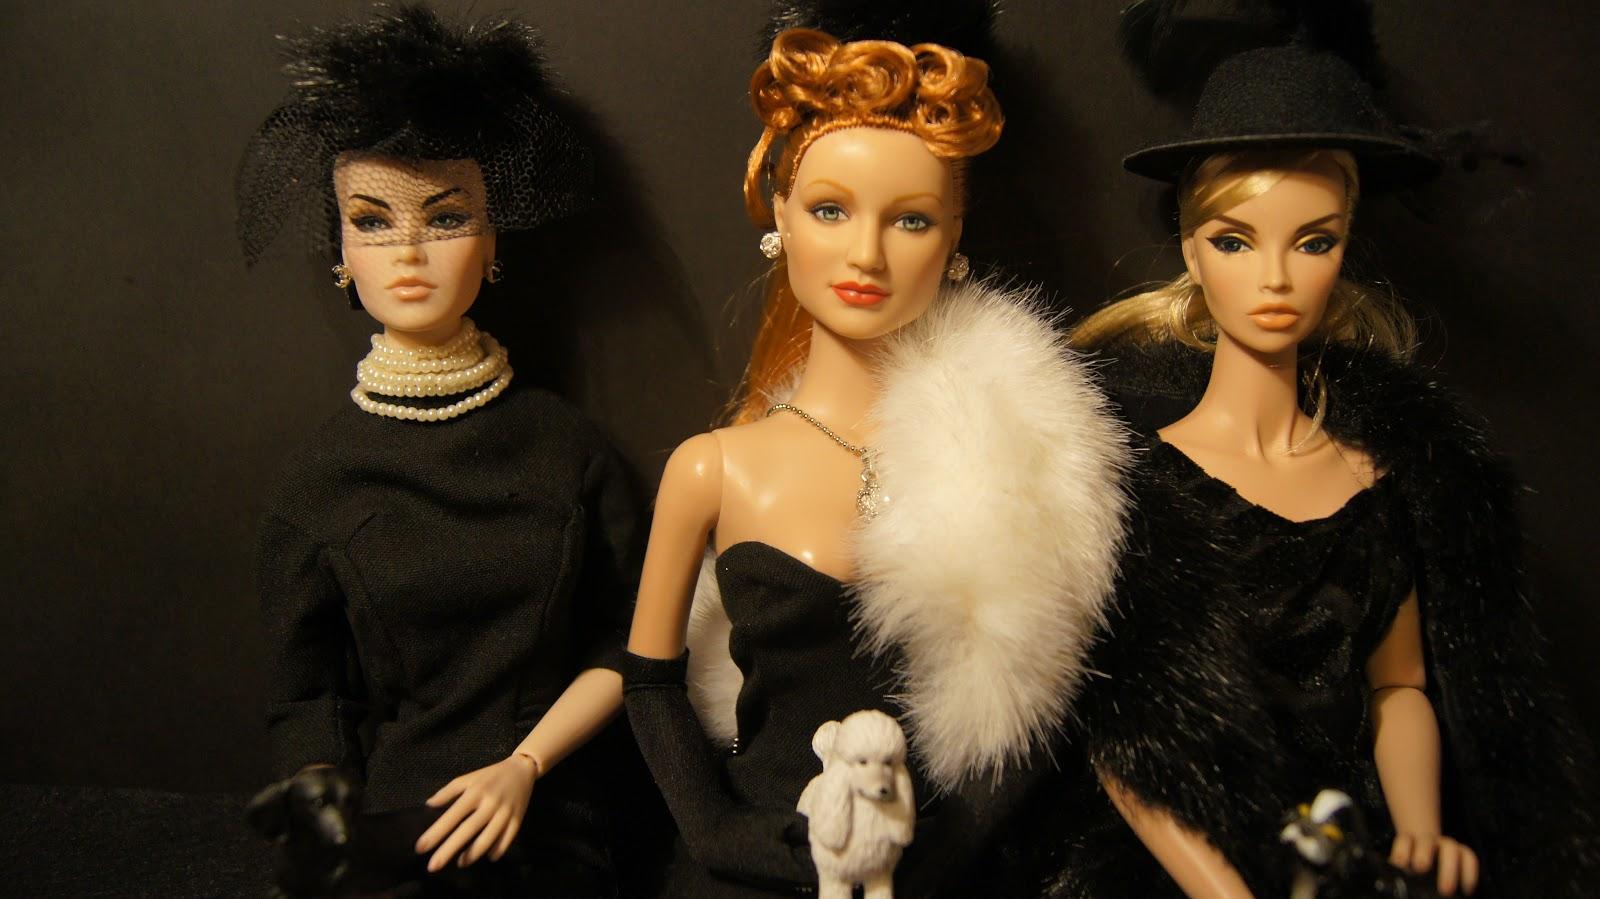 ETA Collectible Fashion Doll Store We ship worldwide! Fashion royalty doll sale